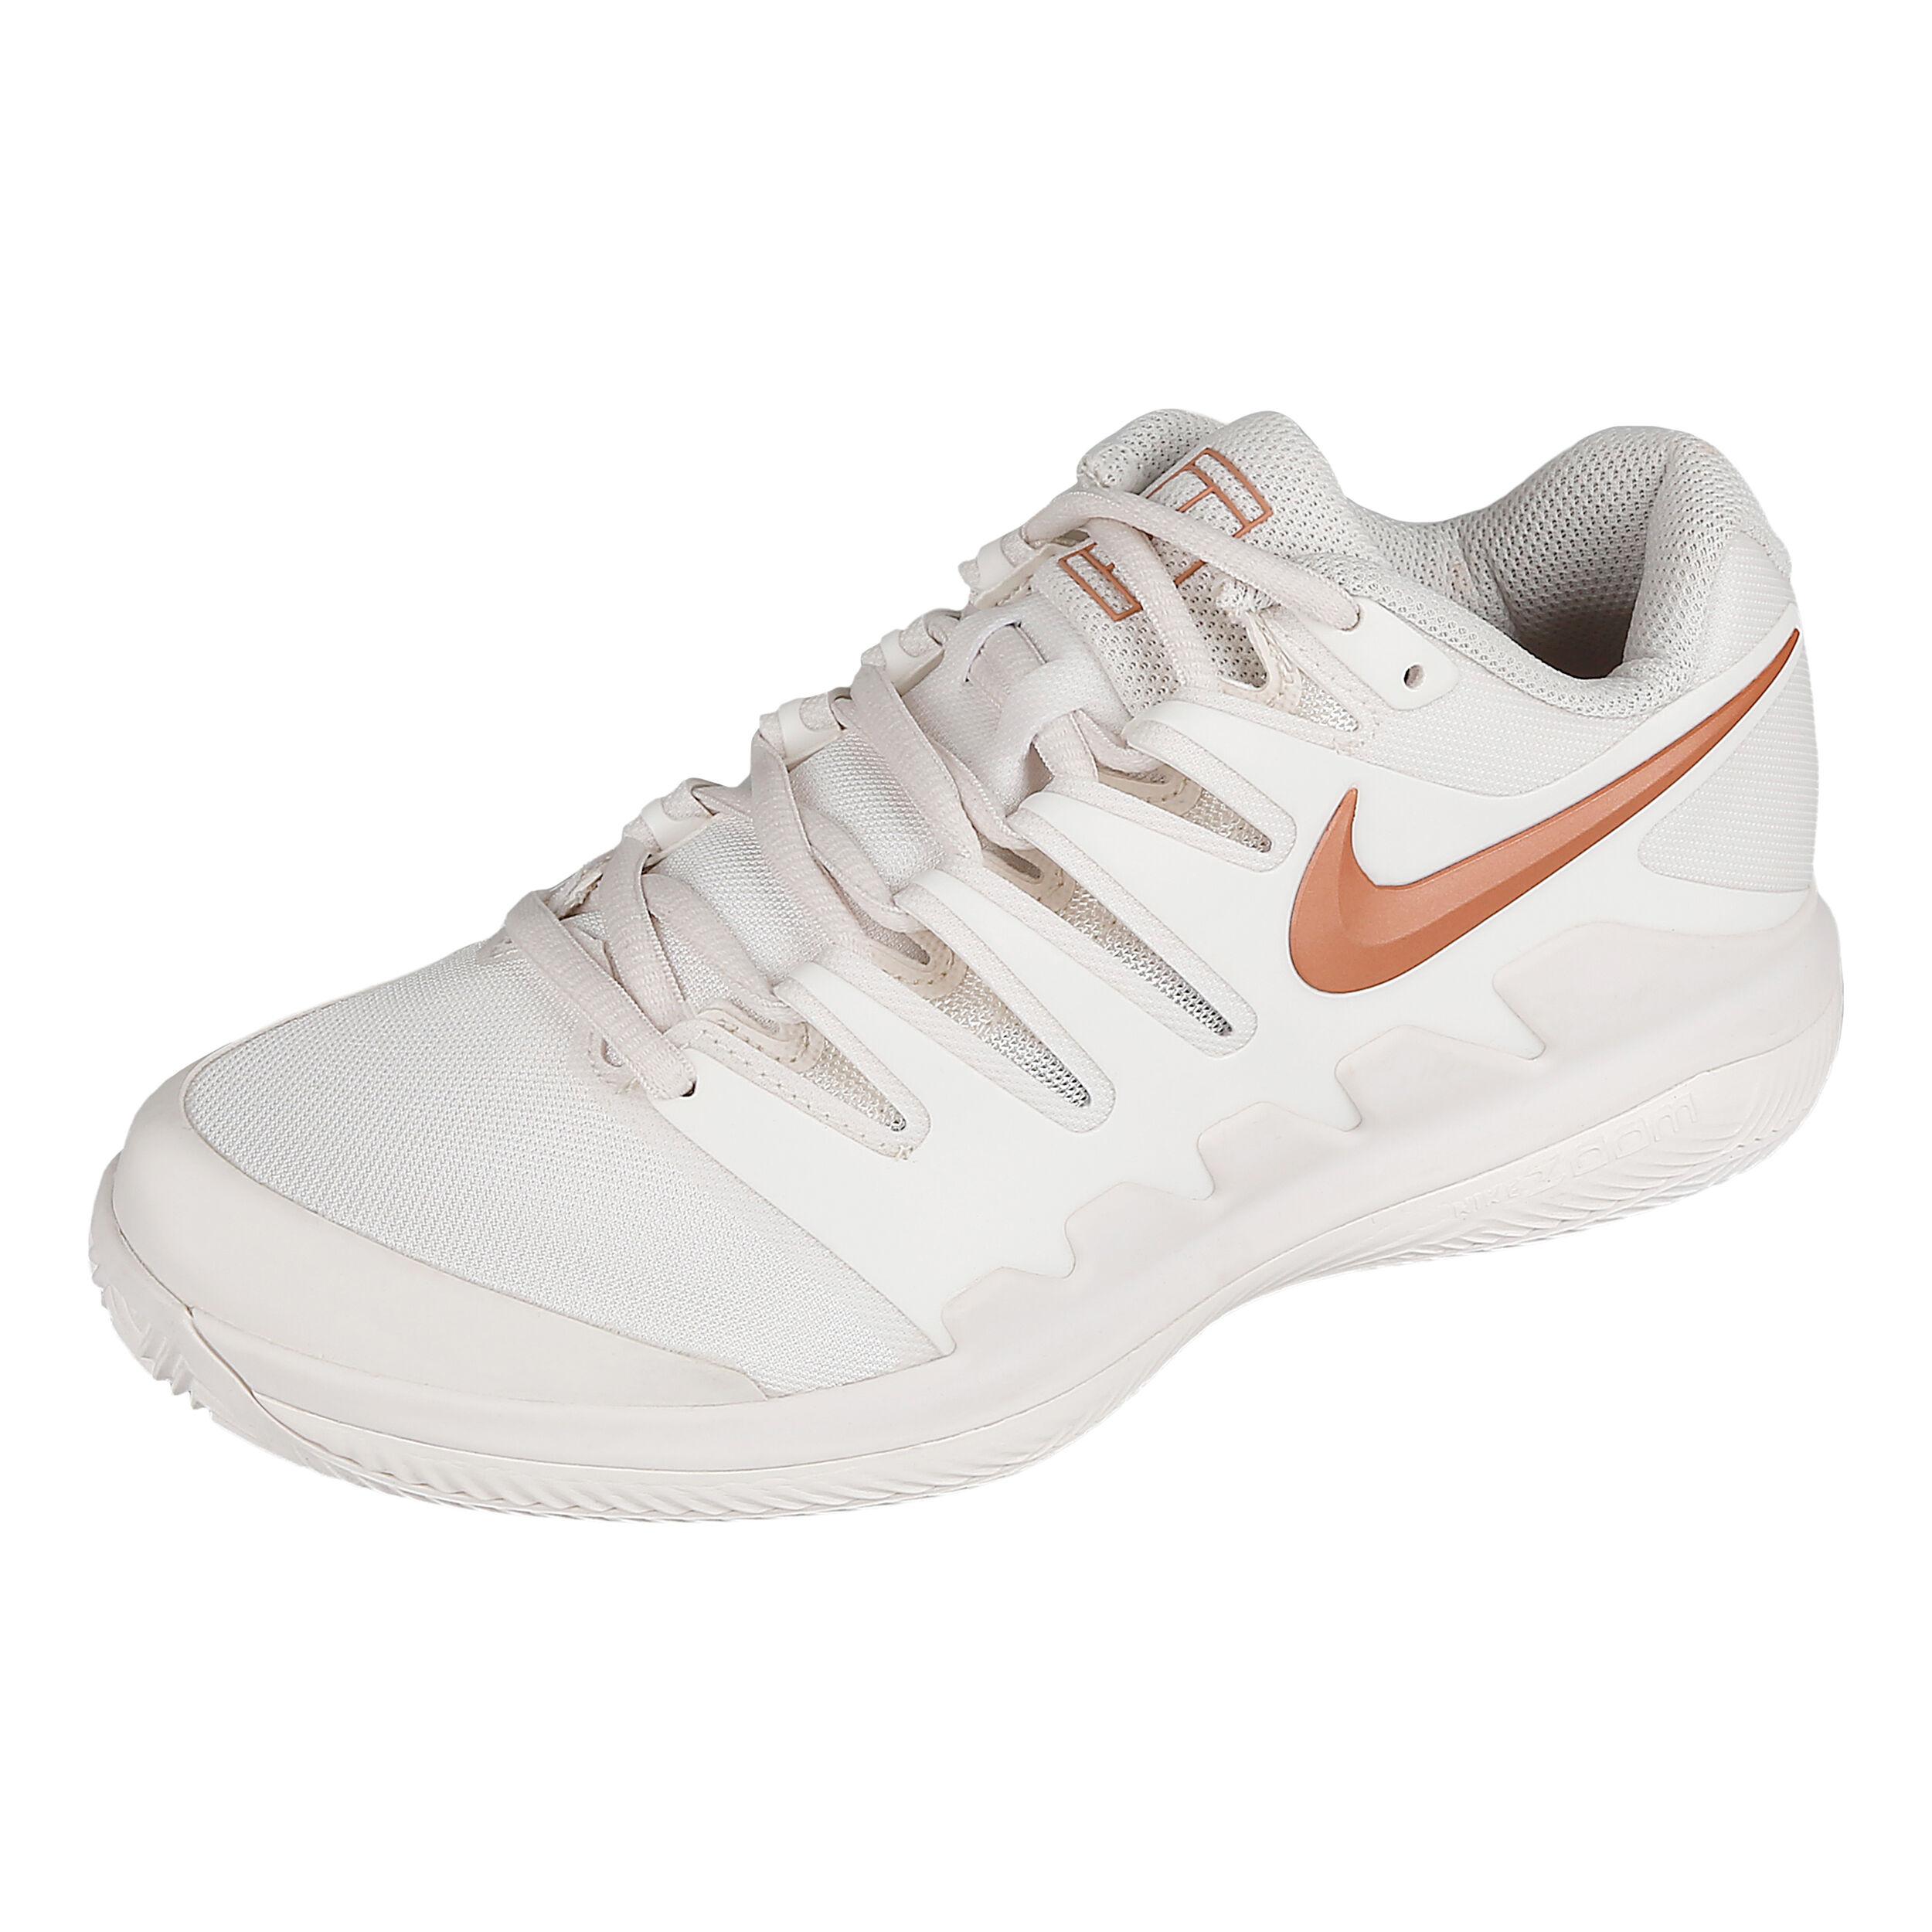 Nike Air Zoom Vapor X Clay Gravelschoen Dames - Crème ...